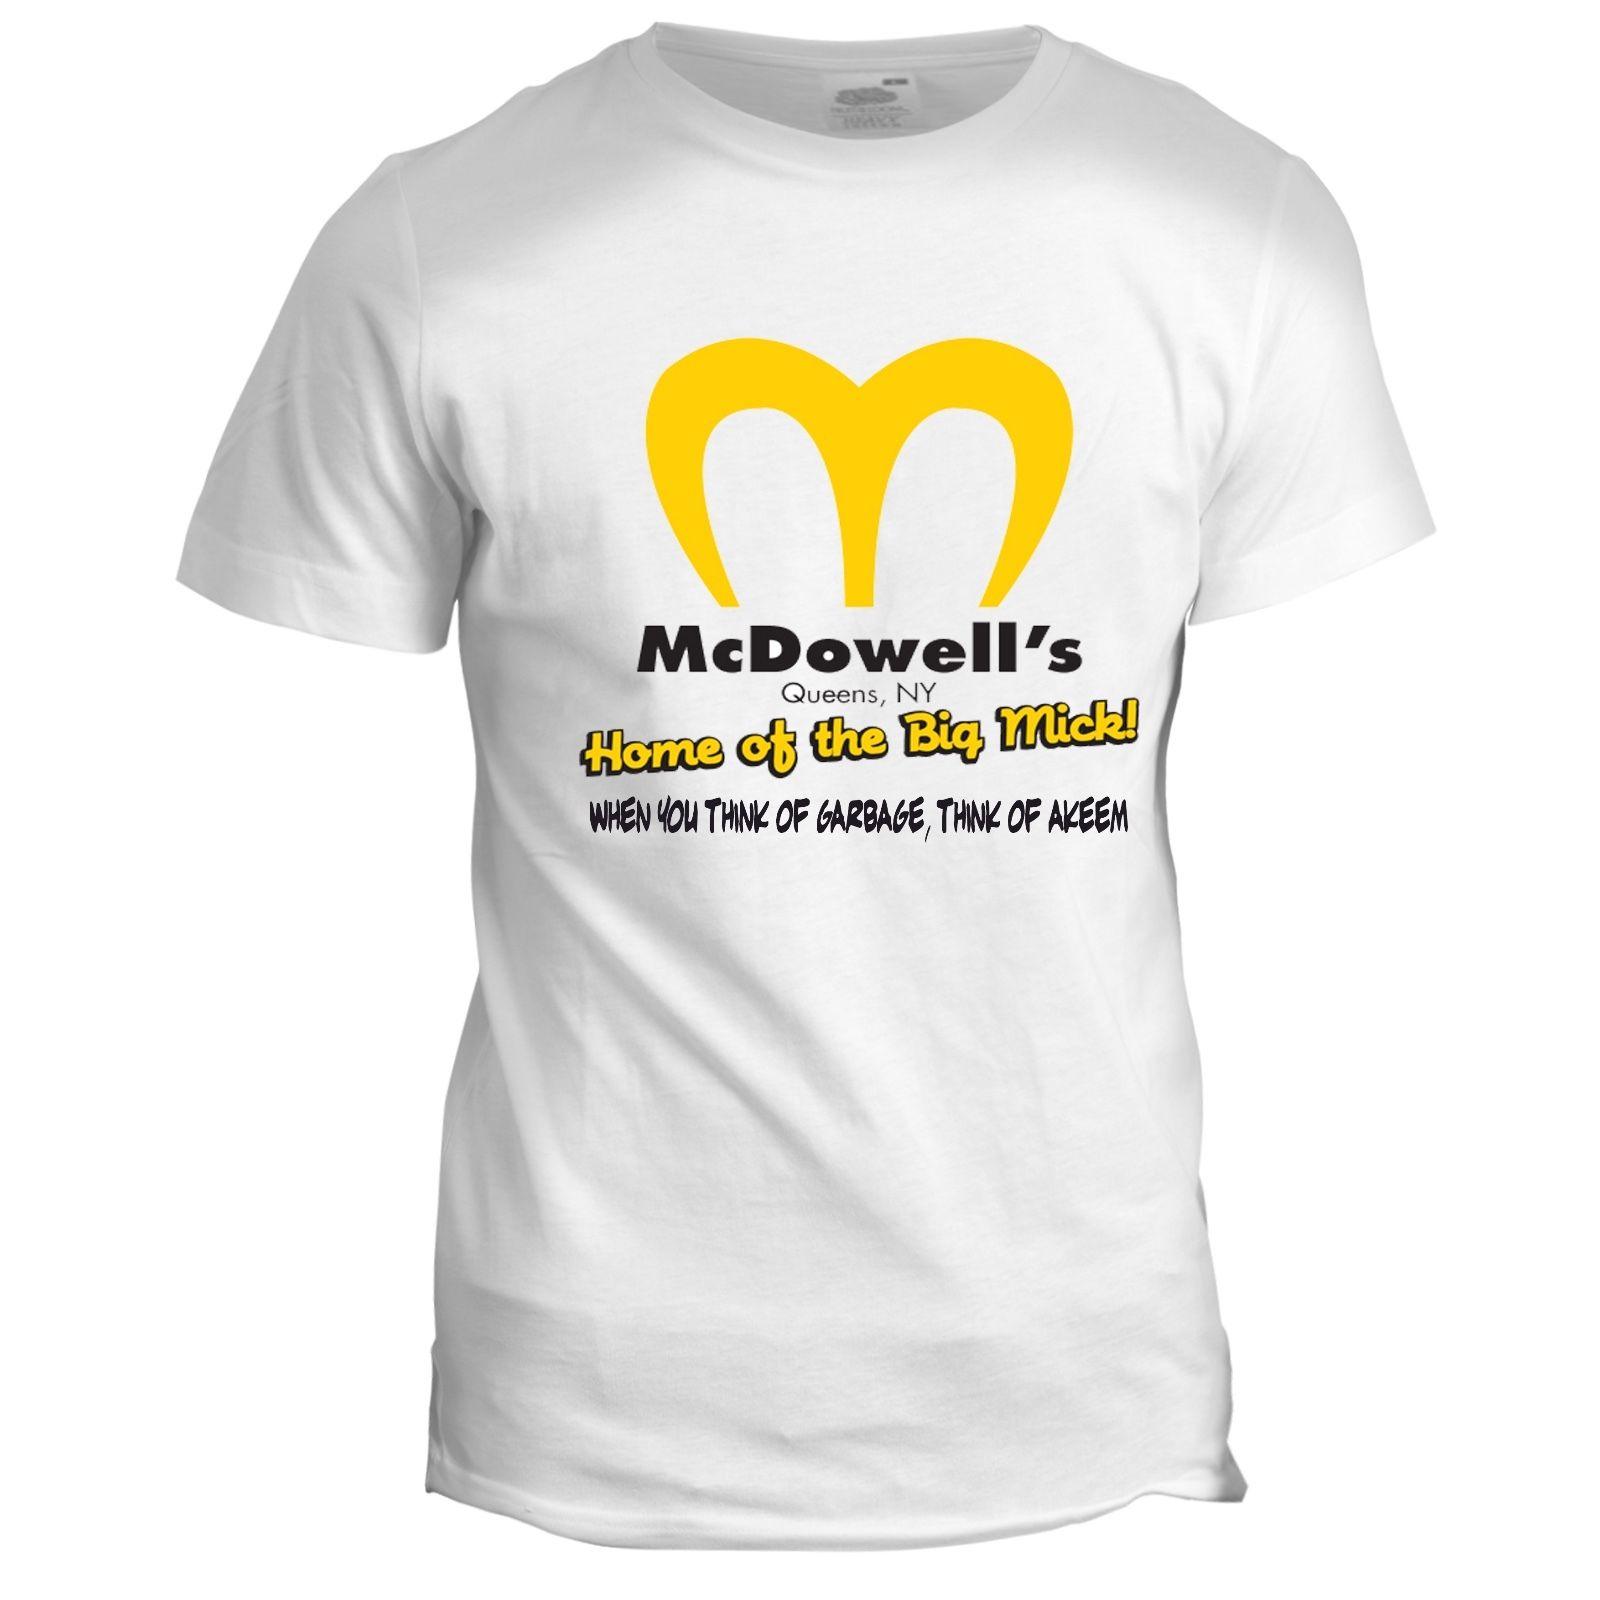 Coming to America Inspired McDowells Eddie Murphy Movie Film 80s 90s T Shirt Cool Casual pride t shirt men Unisex New Fashion